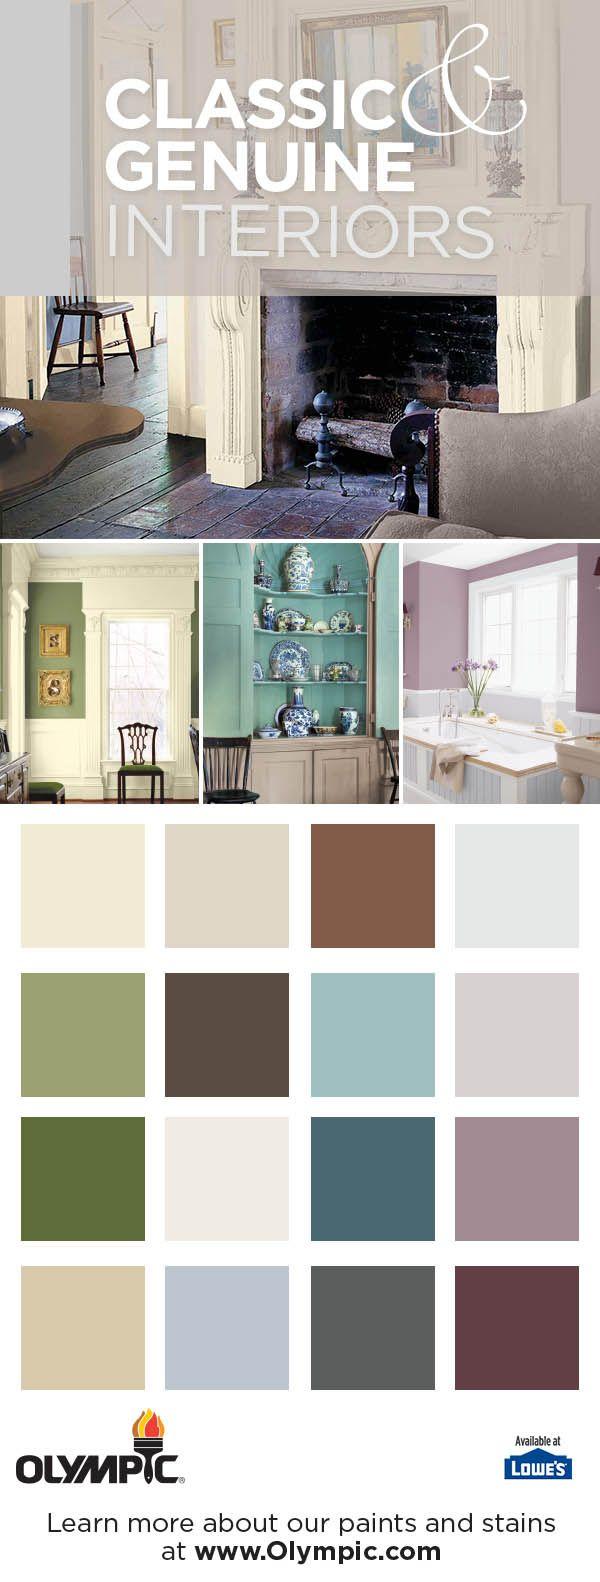 20 Best Classic Genuine Paint Colors Images On Pinterest Paint Colors Olympic Paint And